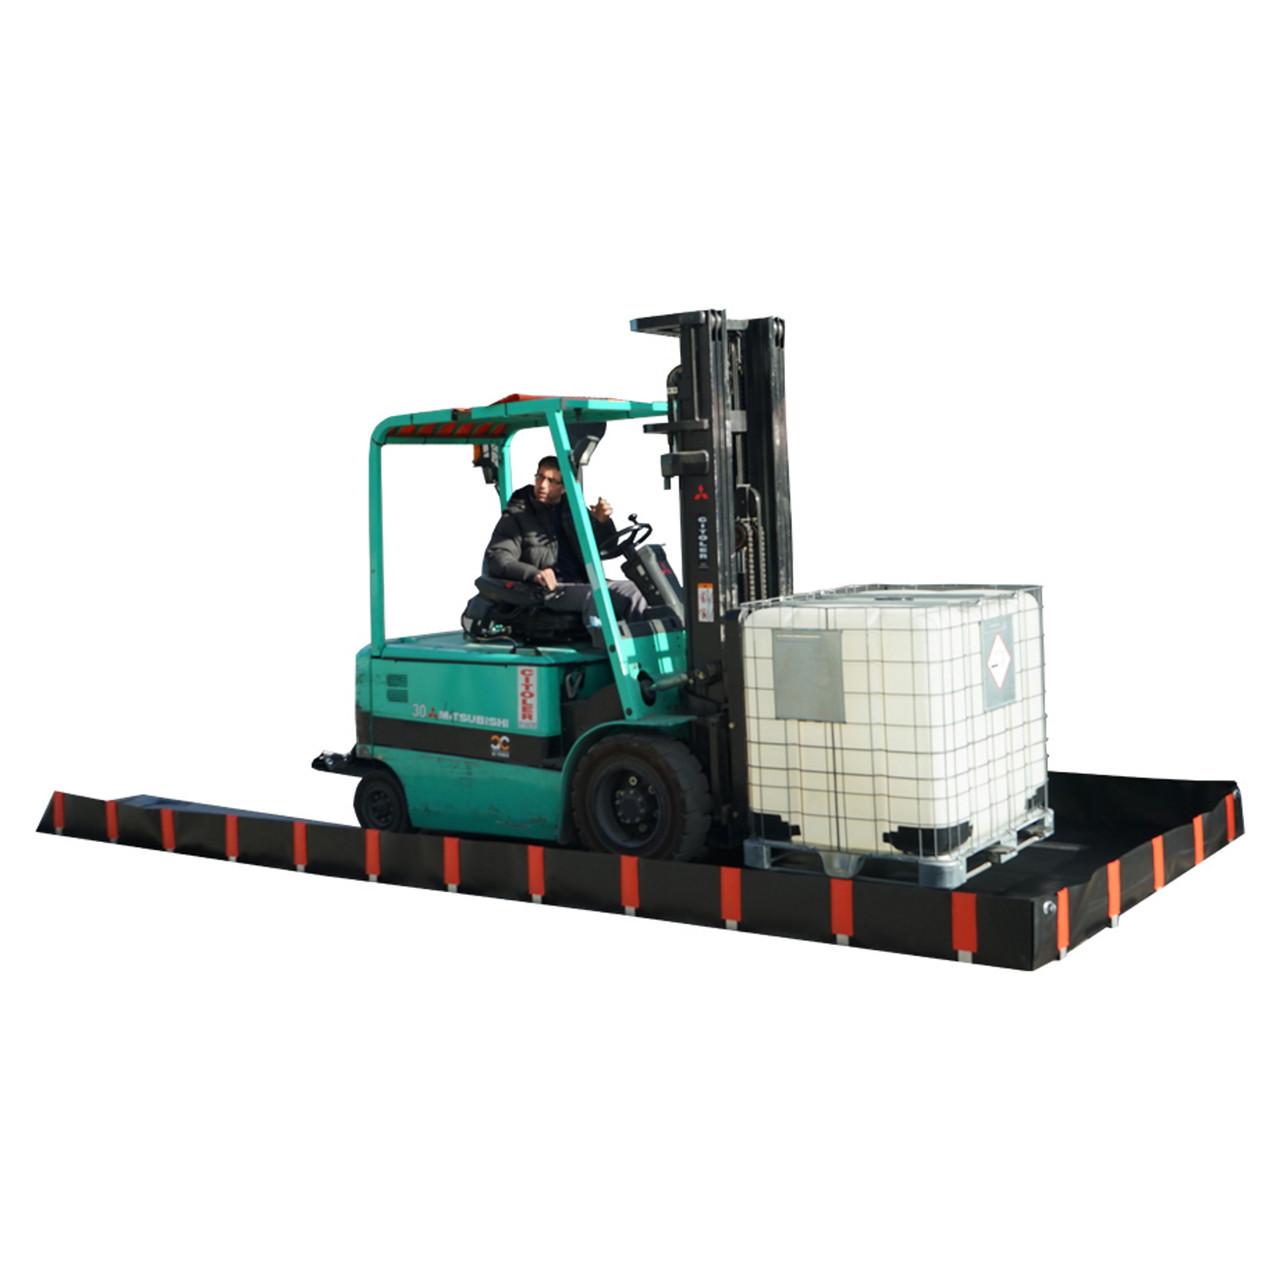 EB6 3750ltr Portable Multi Function Bund (6000x2500x250mm)